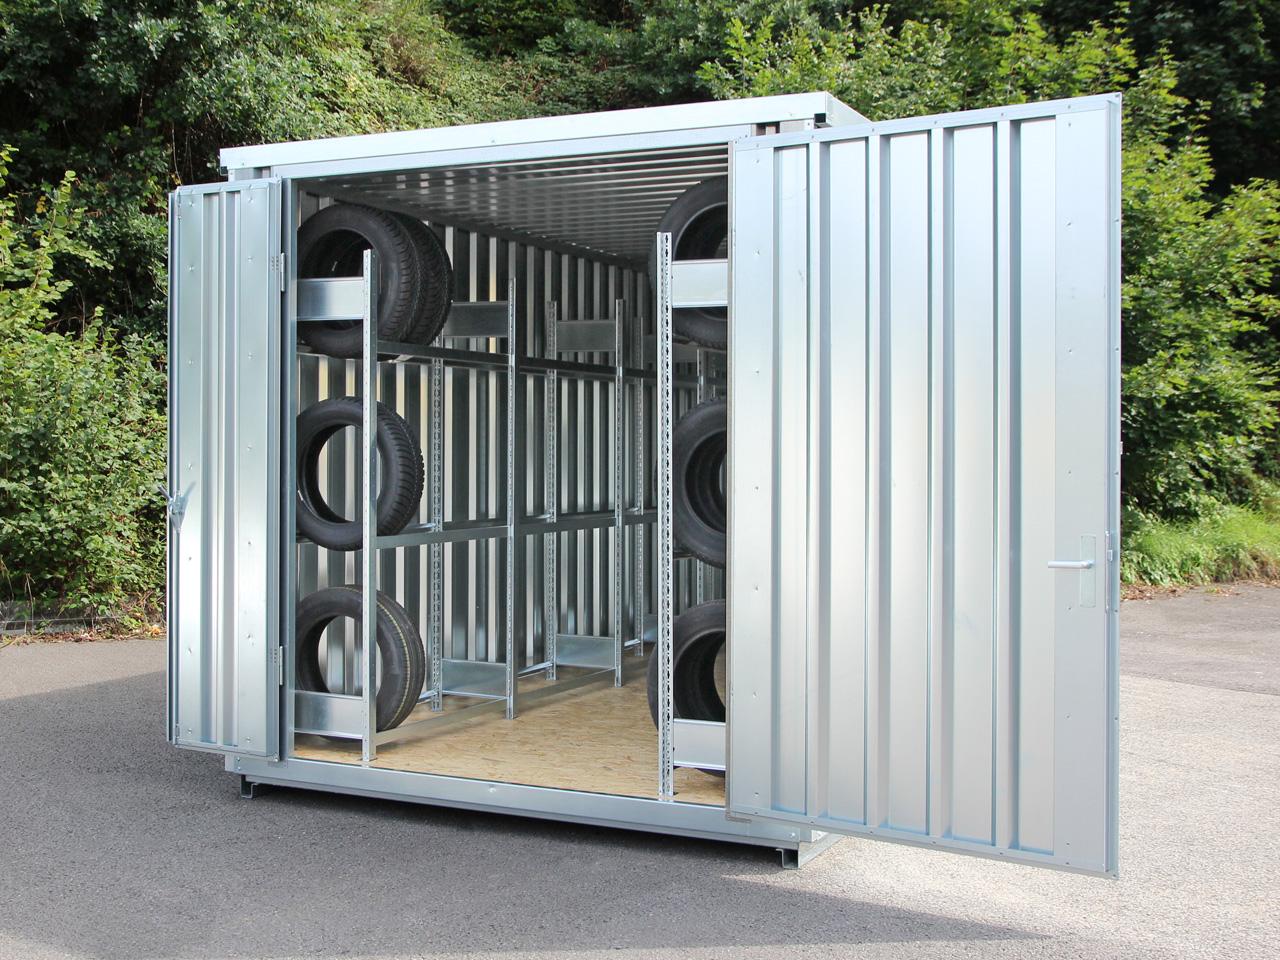 1251620_FLADAFI-Reifencontainer-1600-XXL_R1_RGB_0360_sl.jpg